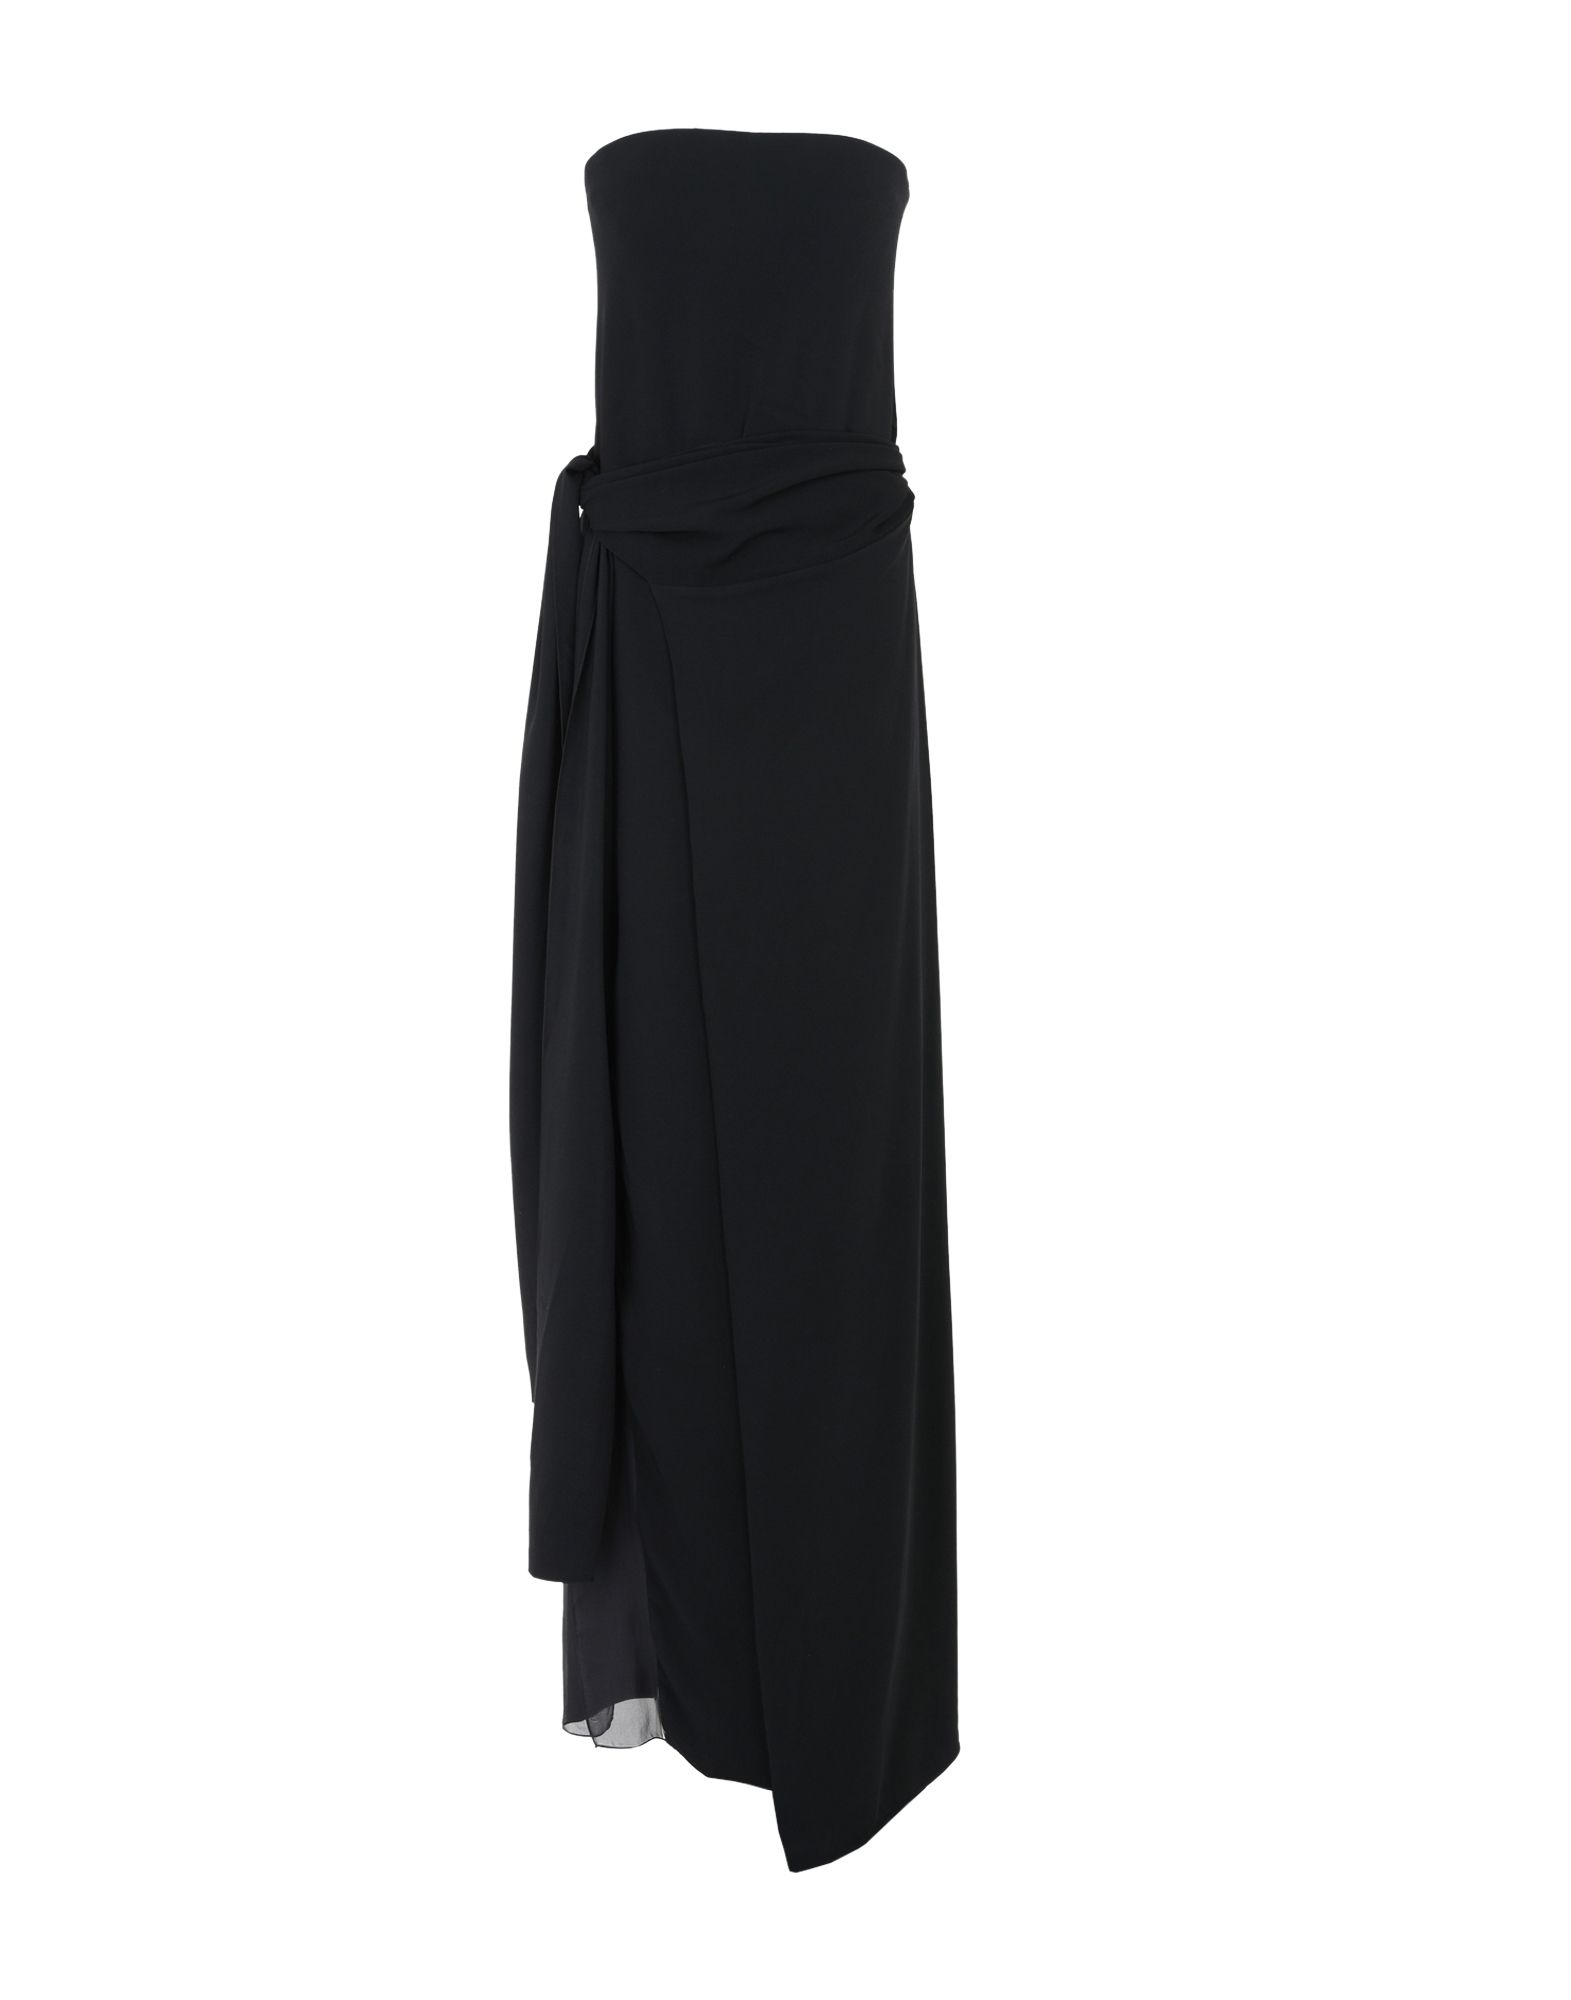 REED KRAKOFF Long Dress in Black